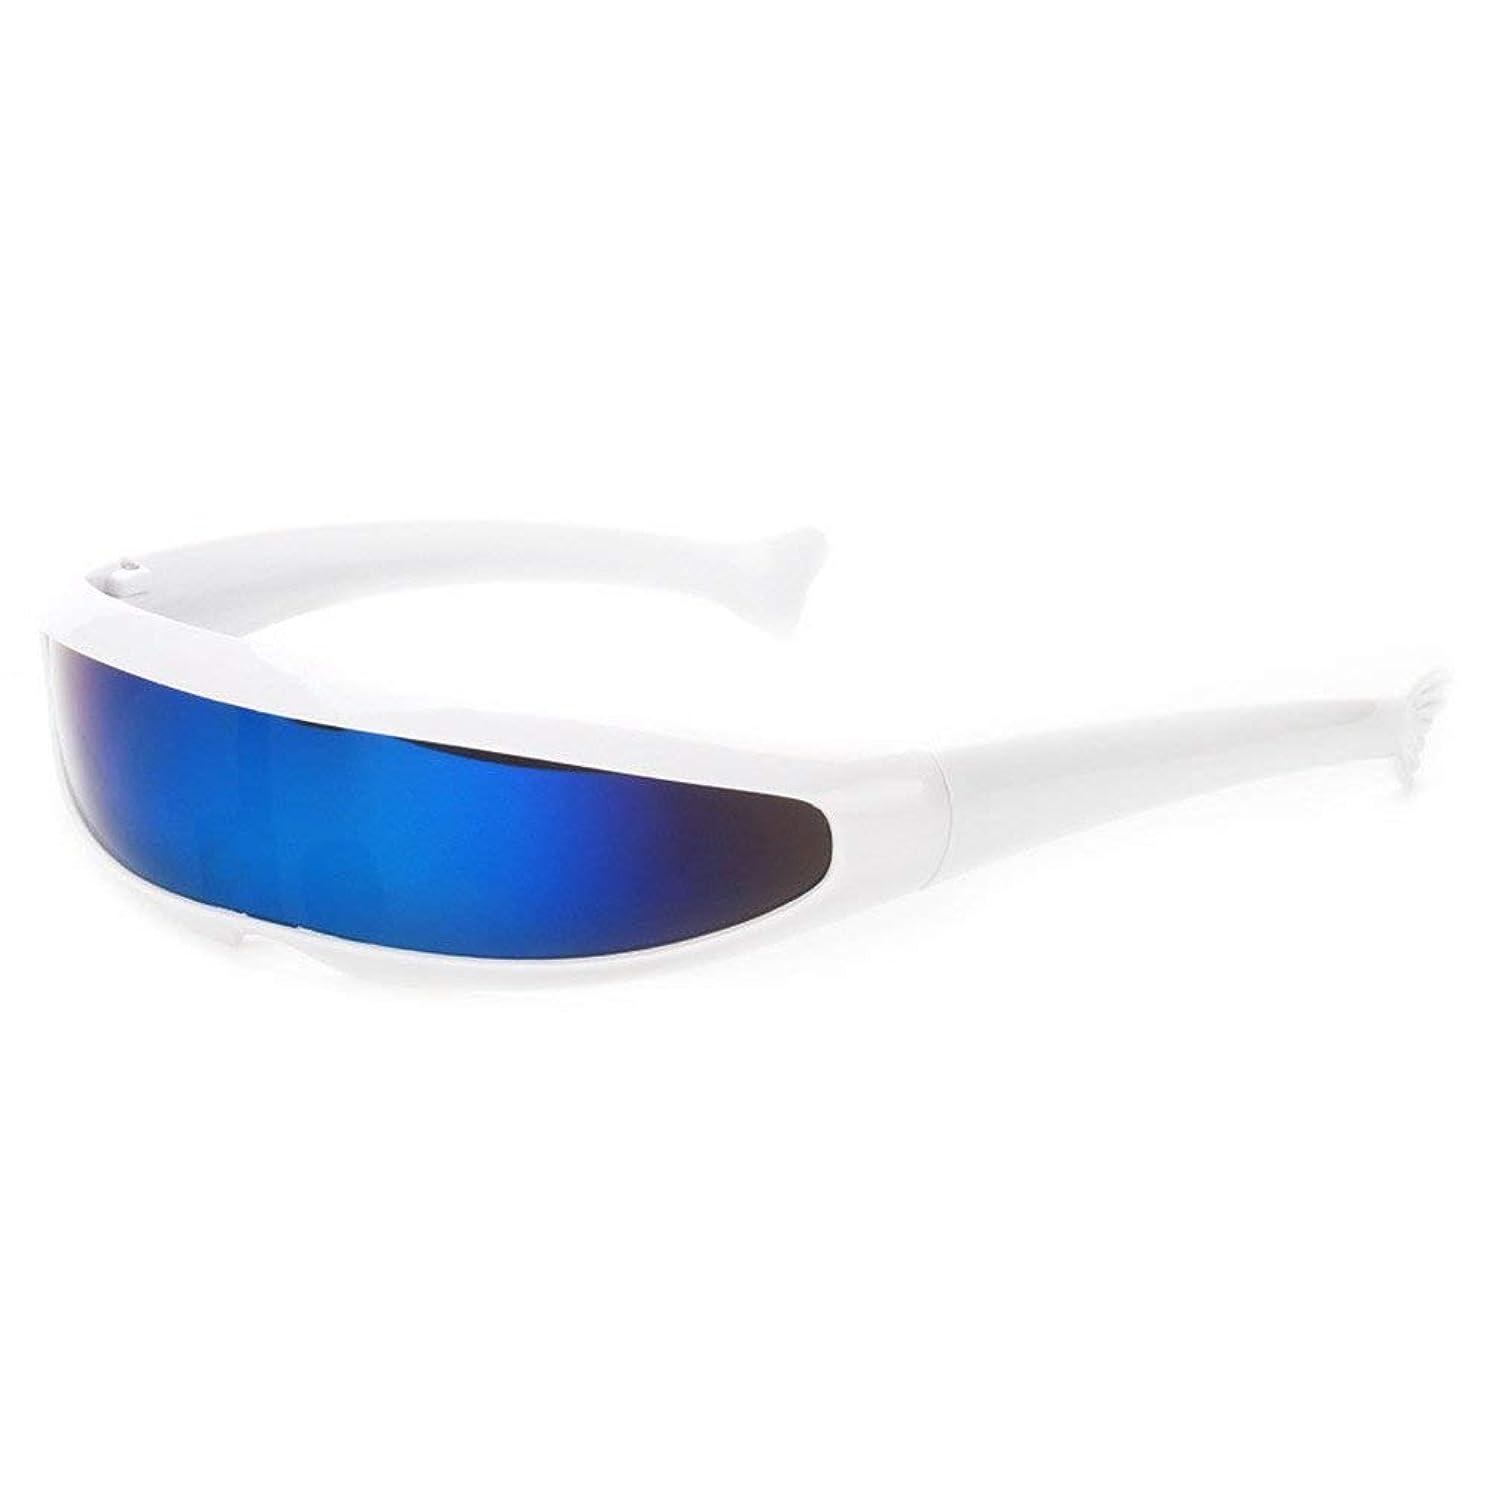 Futuristic Narrow Cyclops Sunglasses UV400 Personality Mirrored Lens